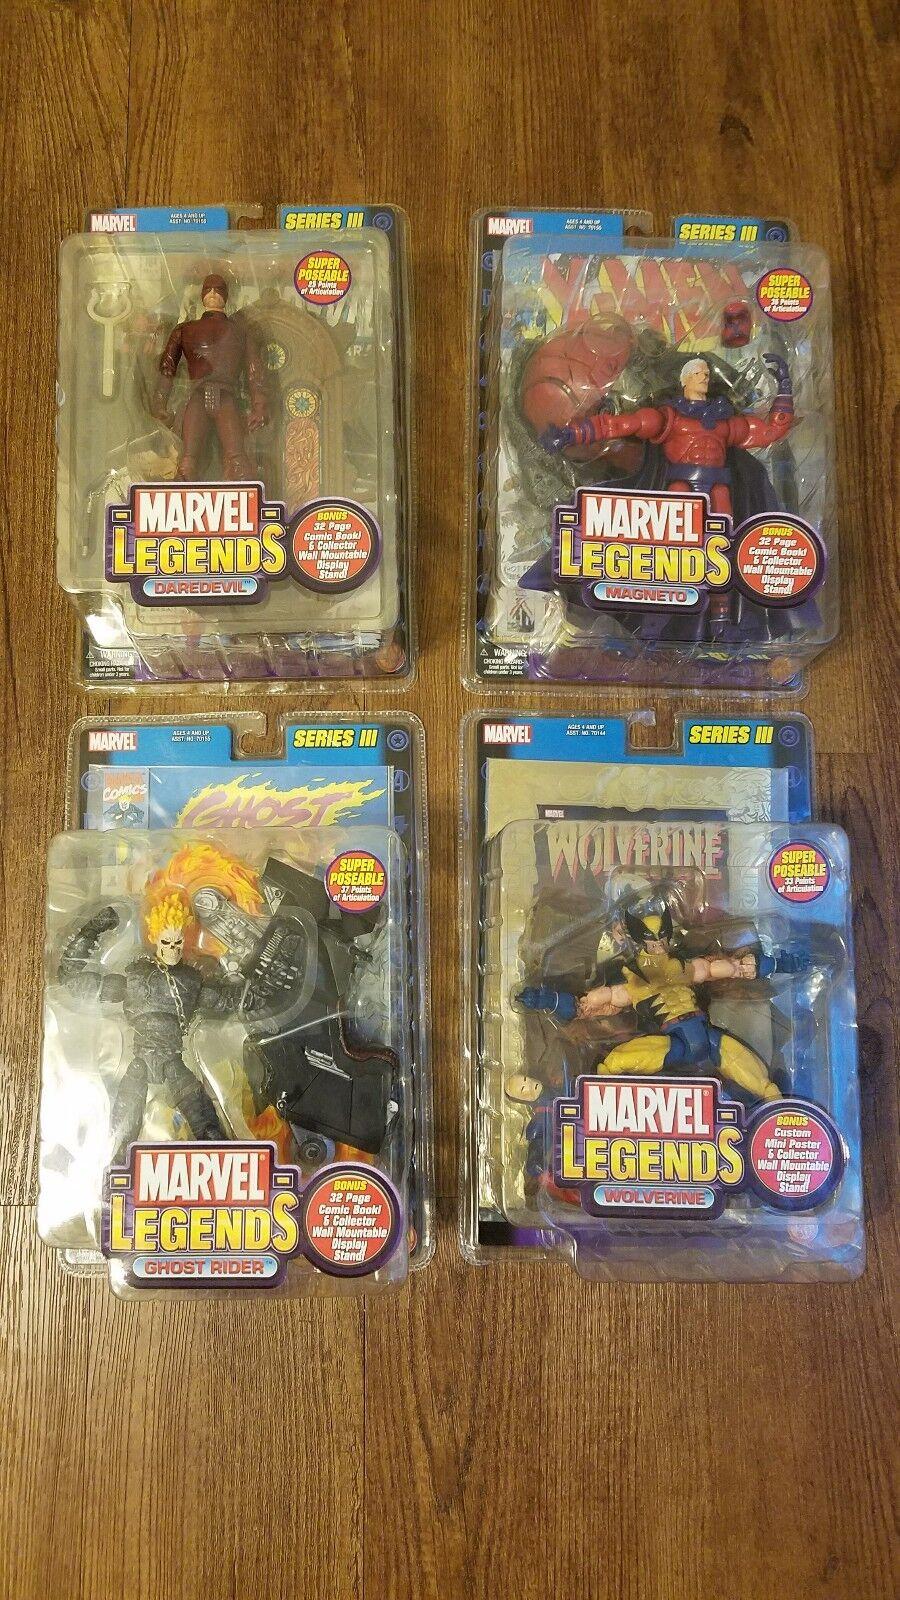 Marvel LEGENDS serie III de 3 Ghost Rider, Wolverine, Darojoevil, & Magneto